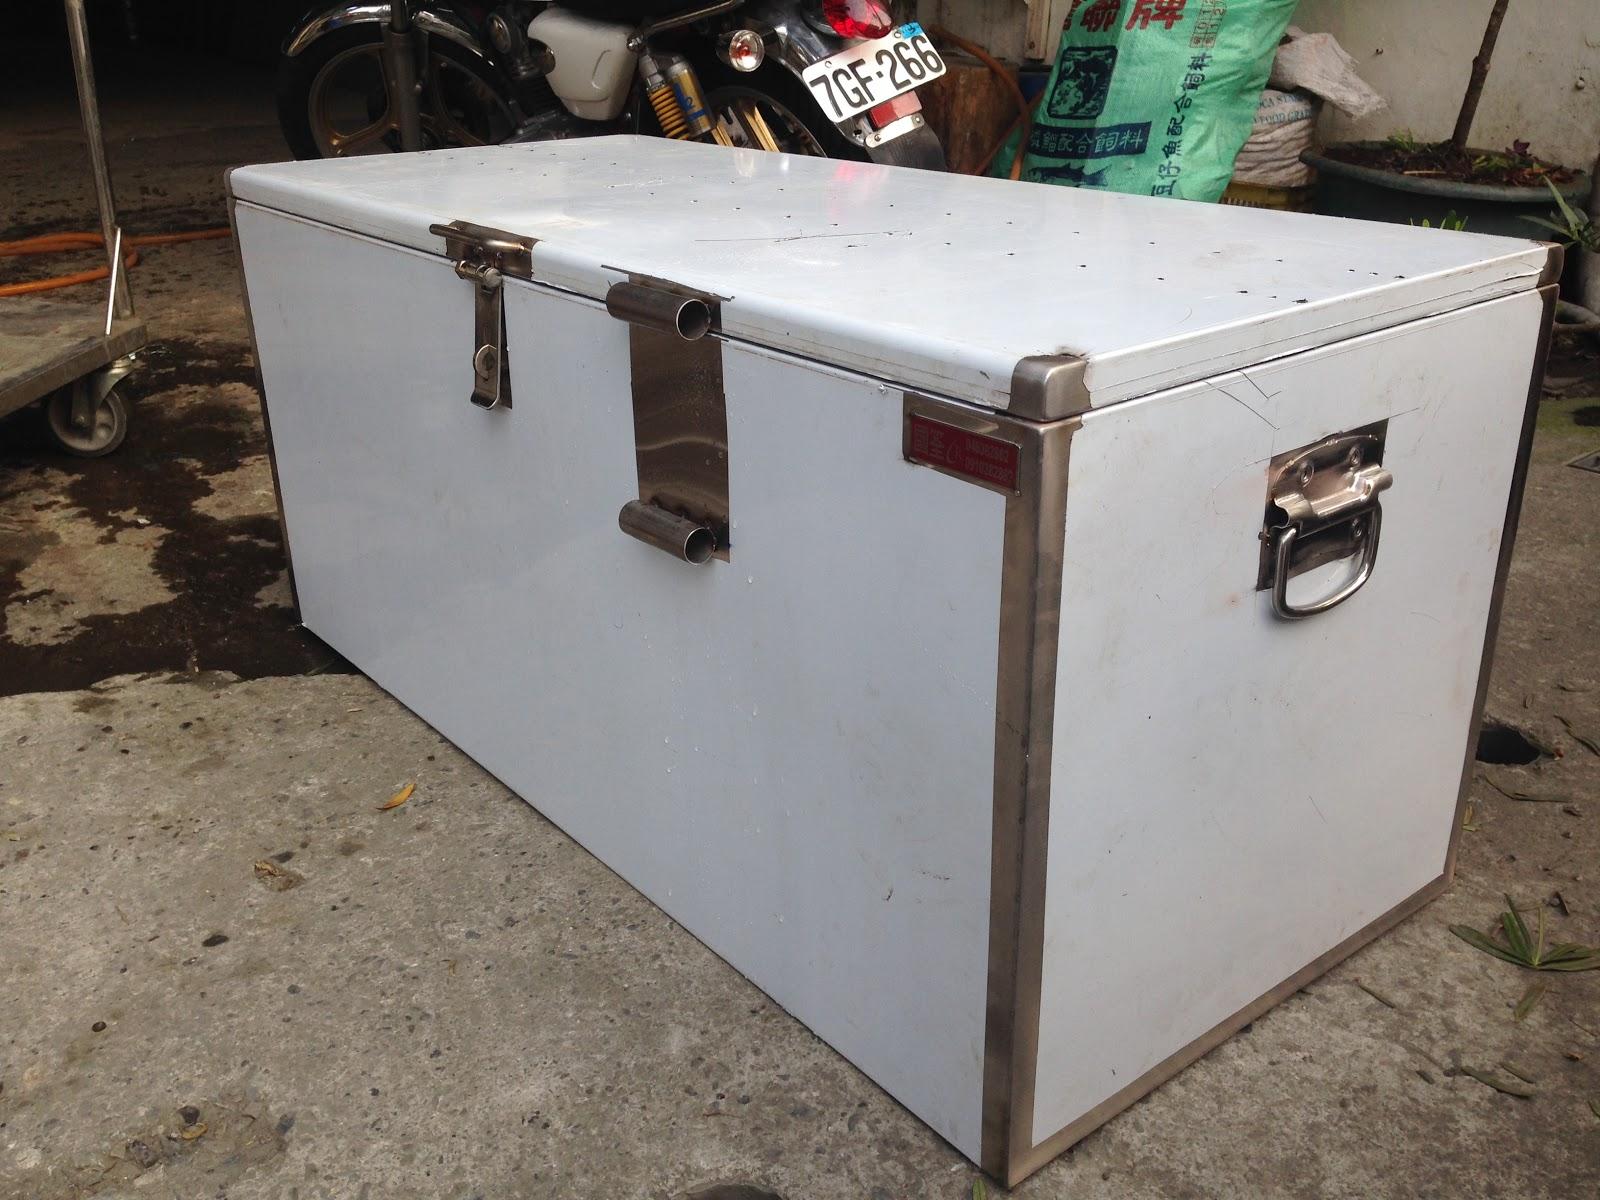 kitchen sink rack scrubbers 餐具架推車、碗盤滴水架、菜架、推車架、滴水網架、晾乾架、料理台、三層架、鍋子收納架、收納架、置物架 ...